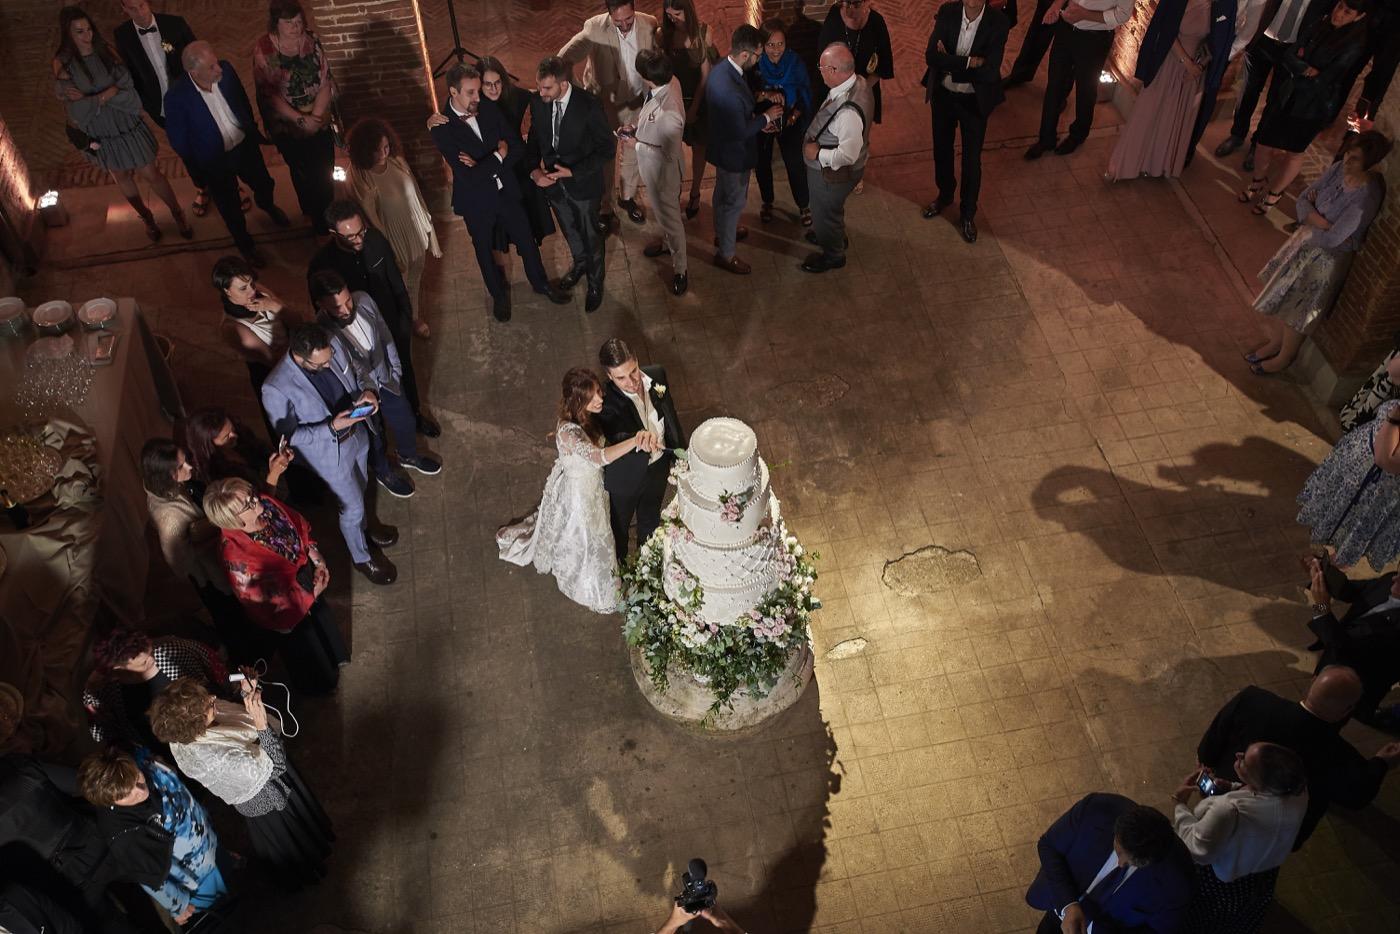 Claudio-Coppola-wedding-photographer-abbazia-7-frati-piegaro-89